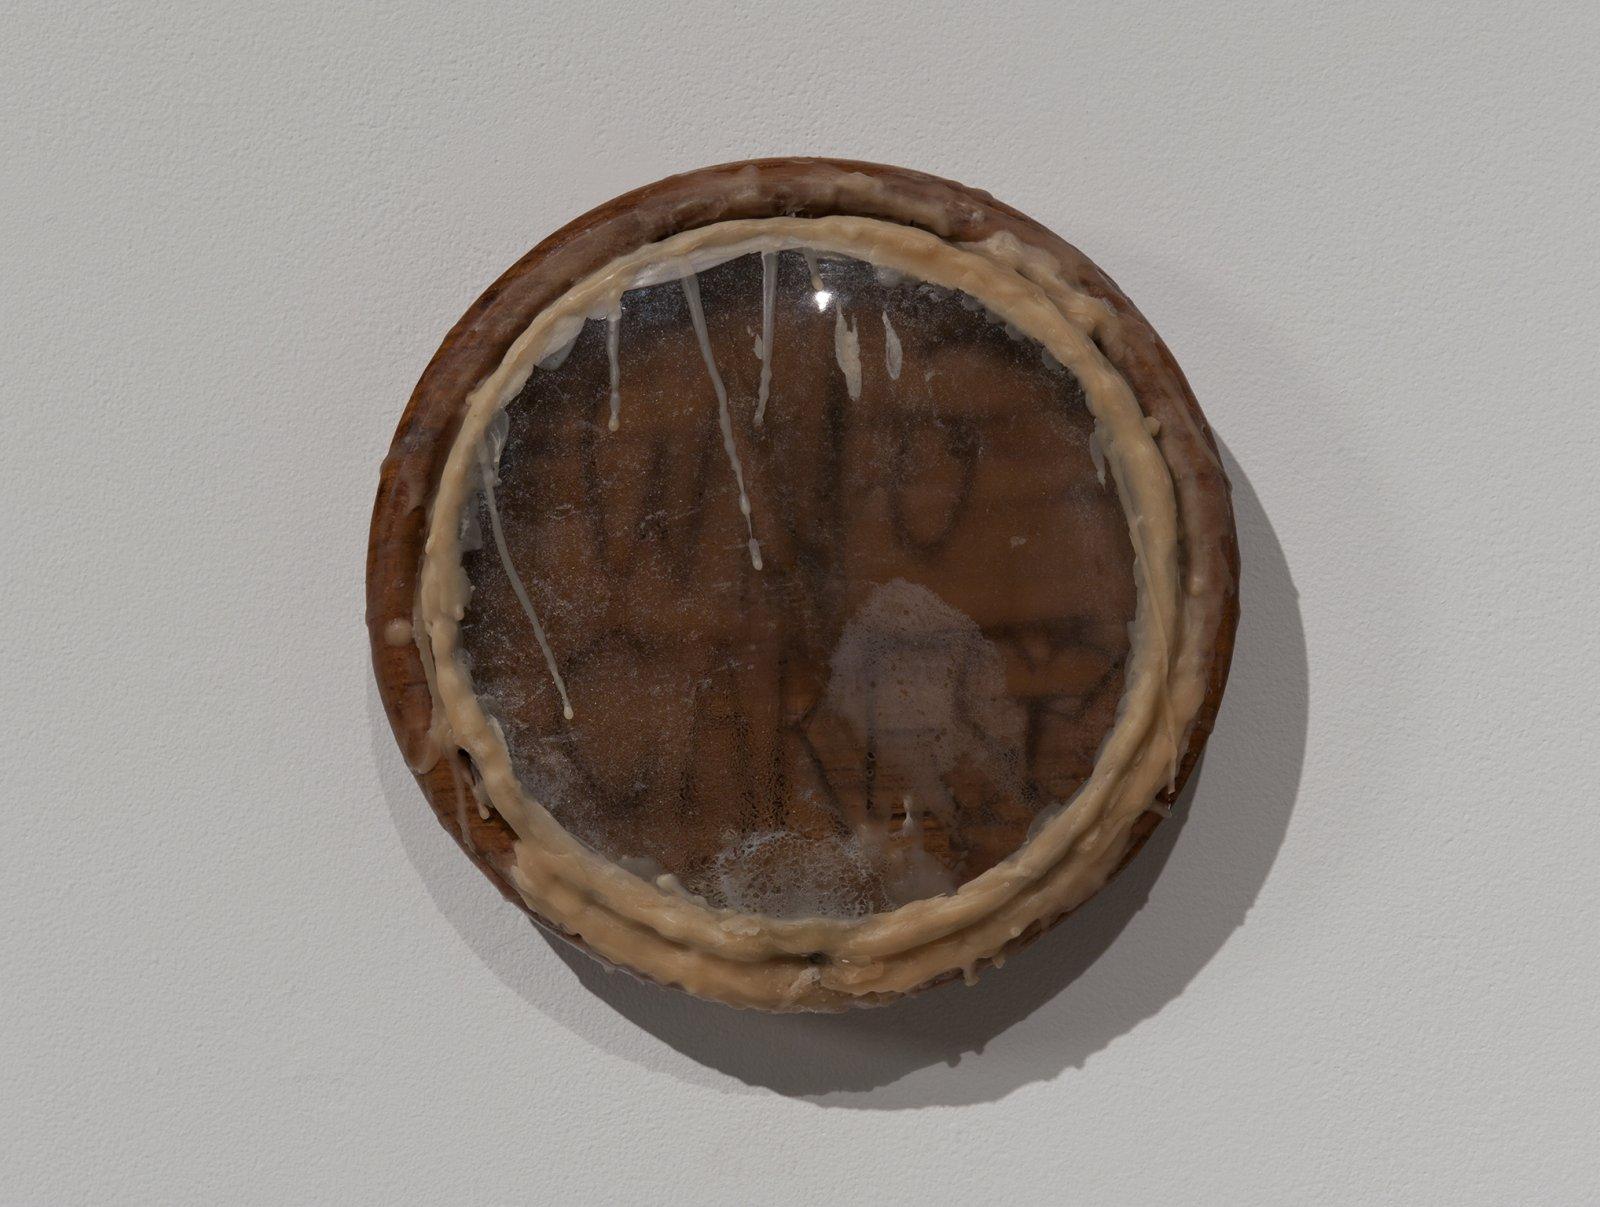 Julia Feyrer, Sauna Clock Diffuser, 2012, wood clock body, condensation, convex glass, wood clock hands, thyme oil, quartz clock movement, 10 x 10 x 3 in. (26 x 26 x 7 cm) by Julia Feyrer